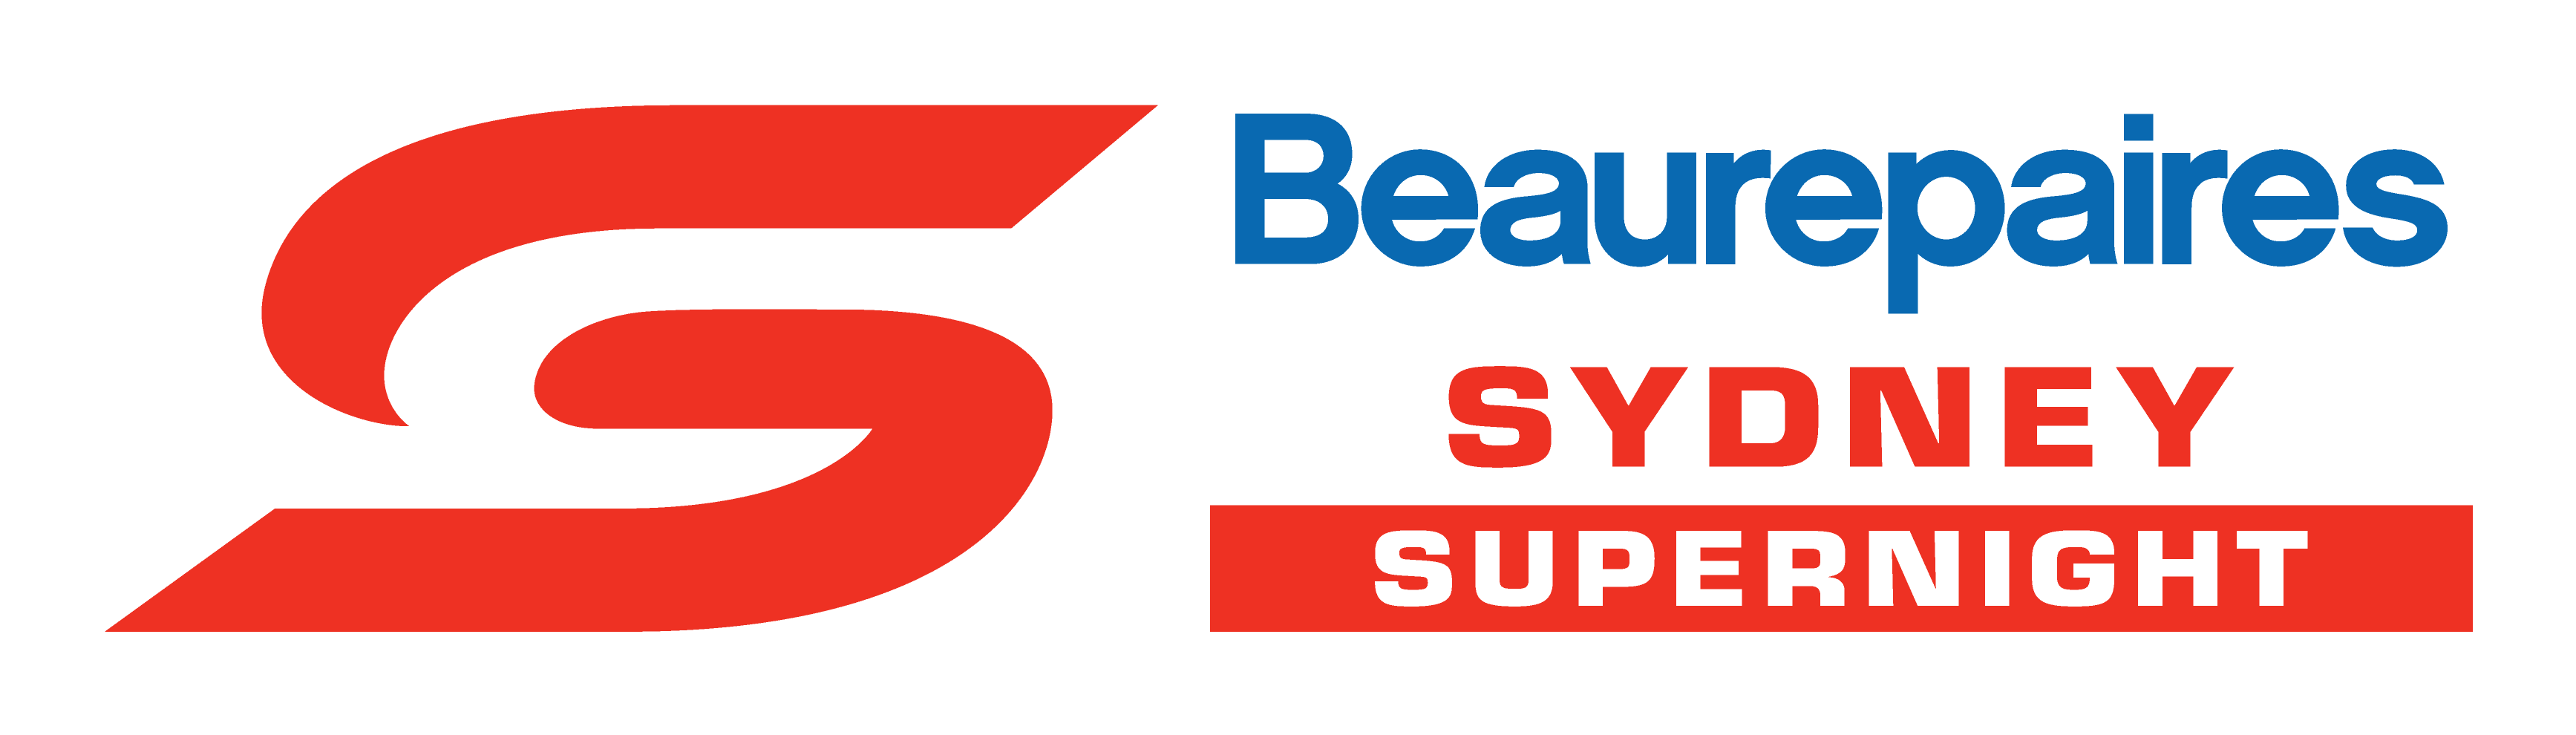 V8 Supercars - Beaurepaires Sydney logo